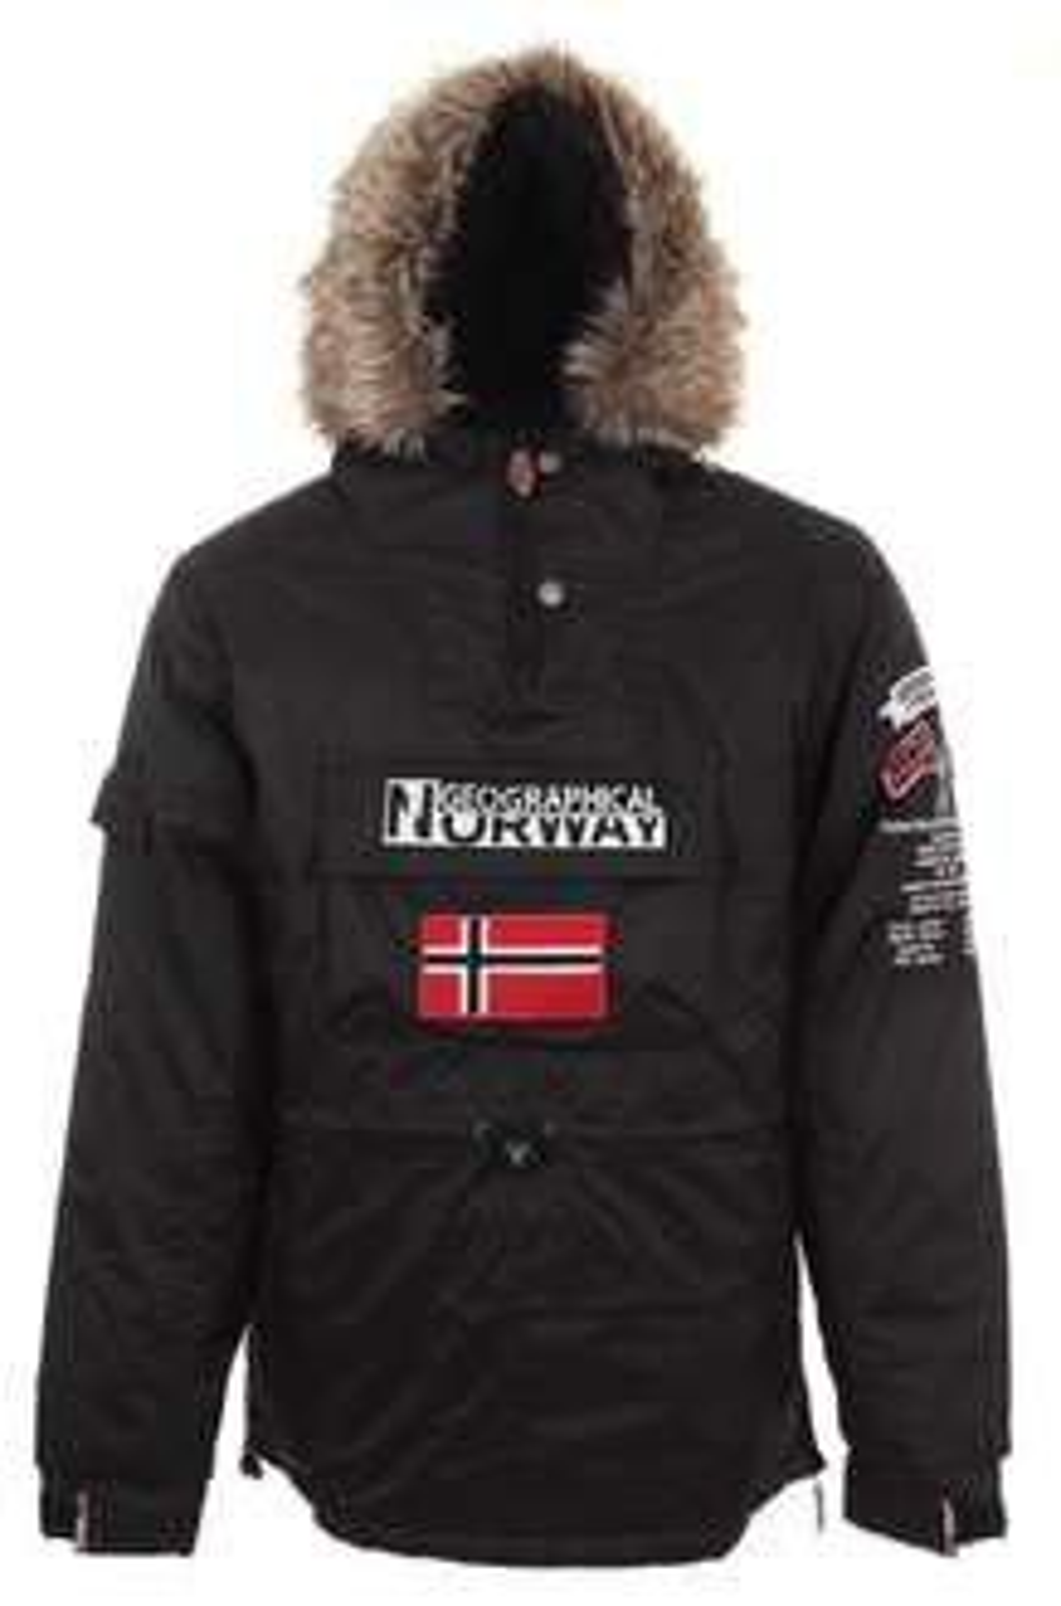 Doudoune Homme Geographical Norway Building - Noir